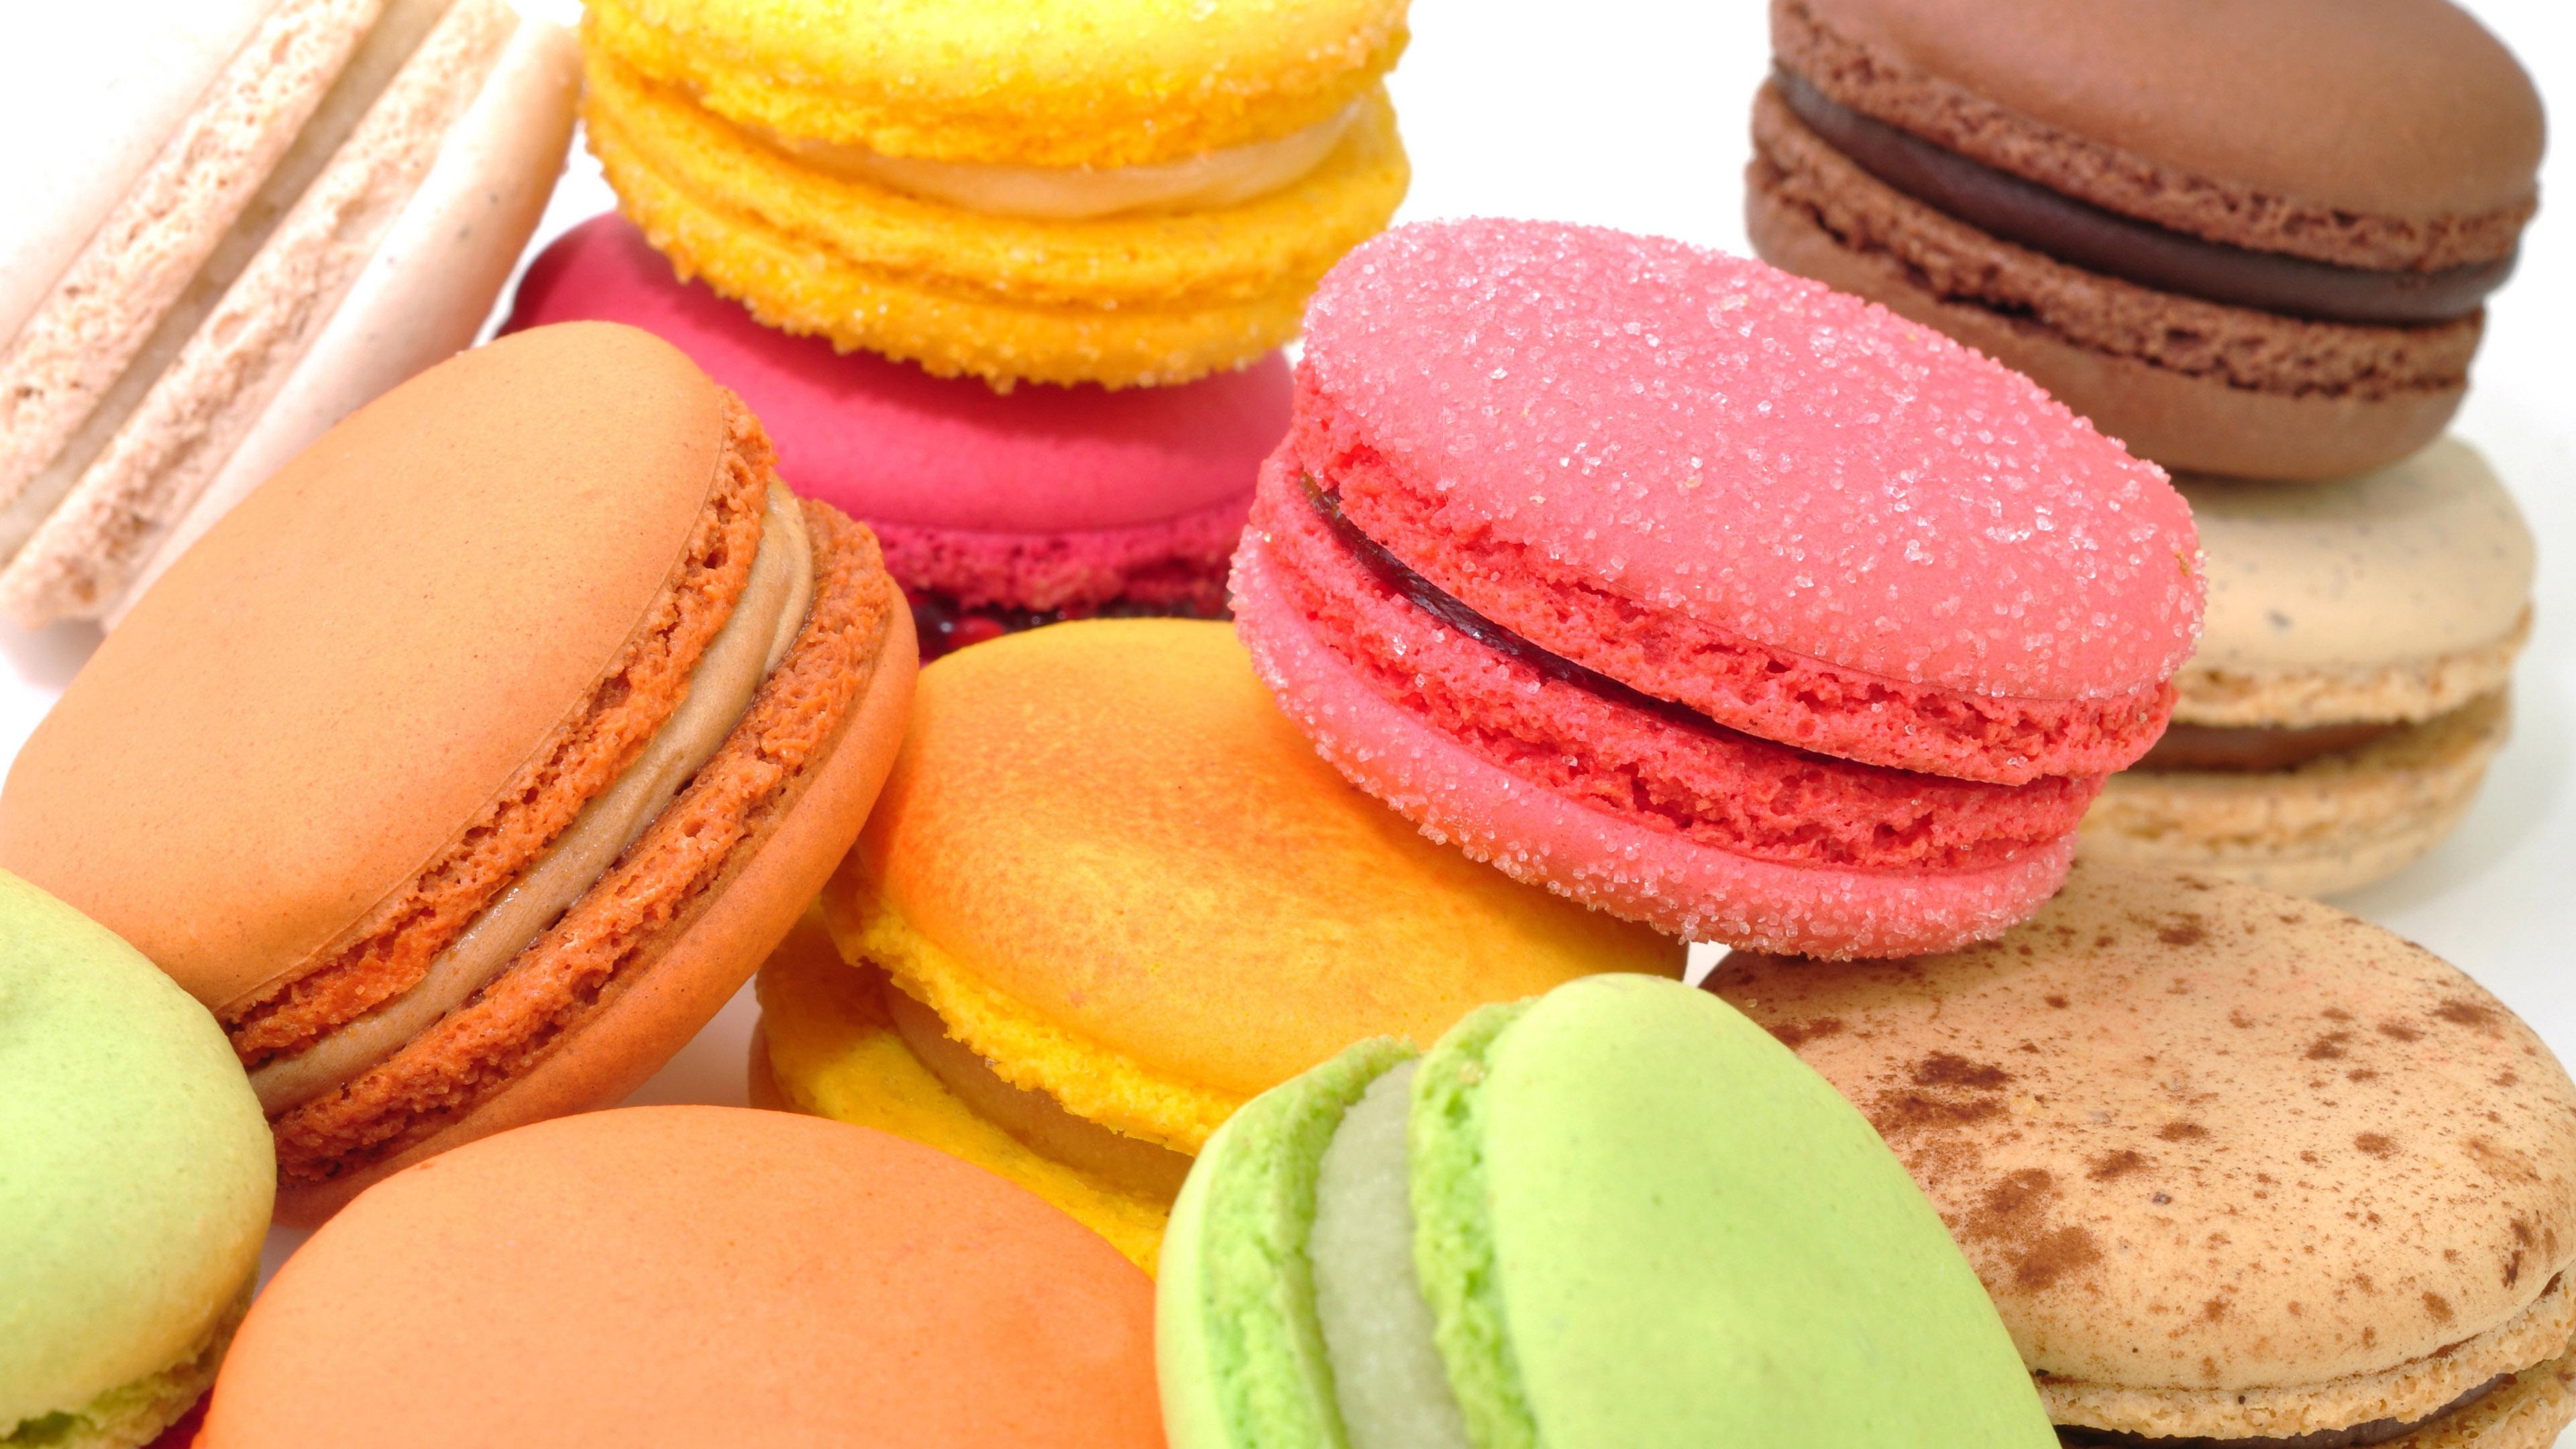 Десерт Макаронс, hd обои еда, 3840 на 2160 пикселей